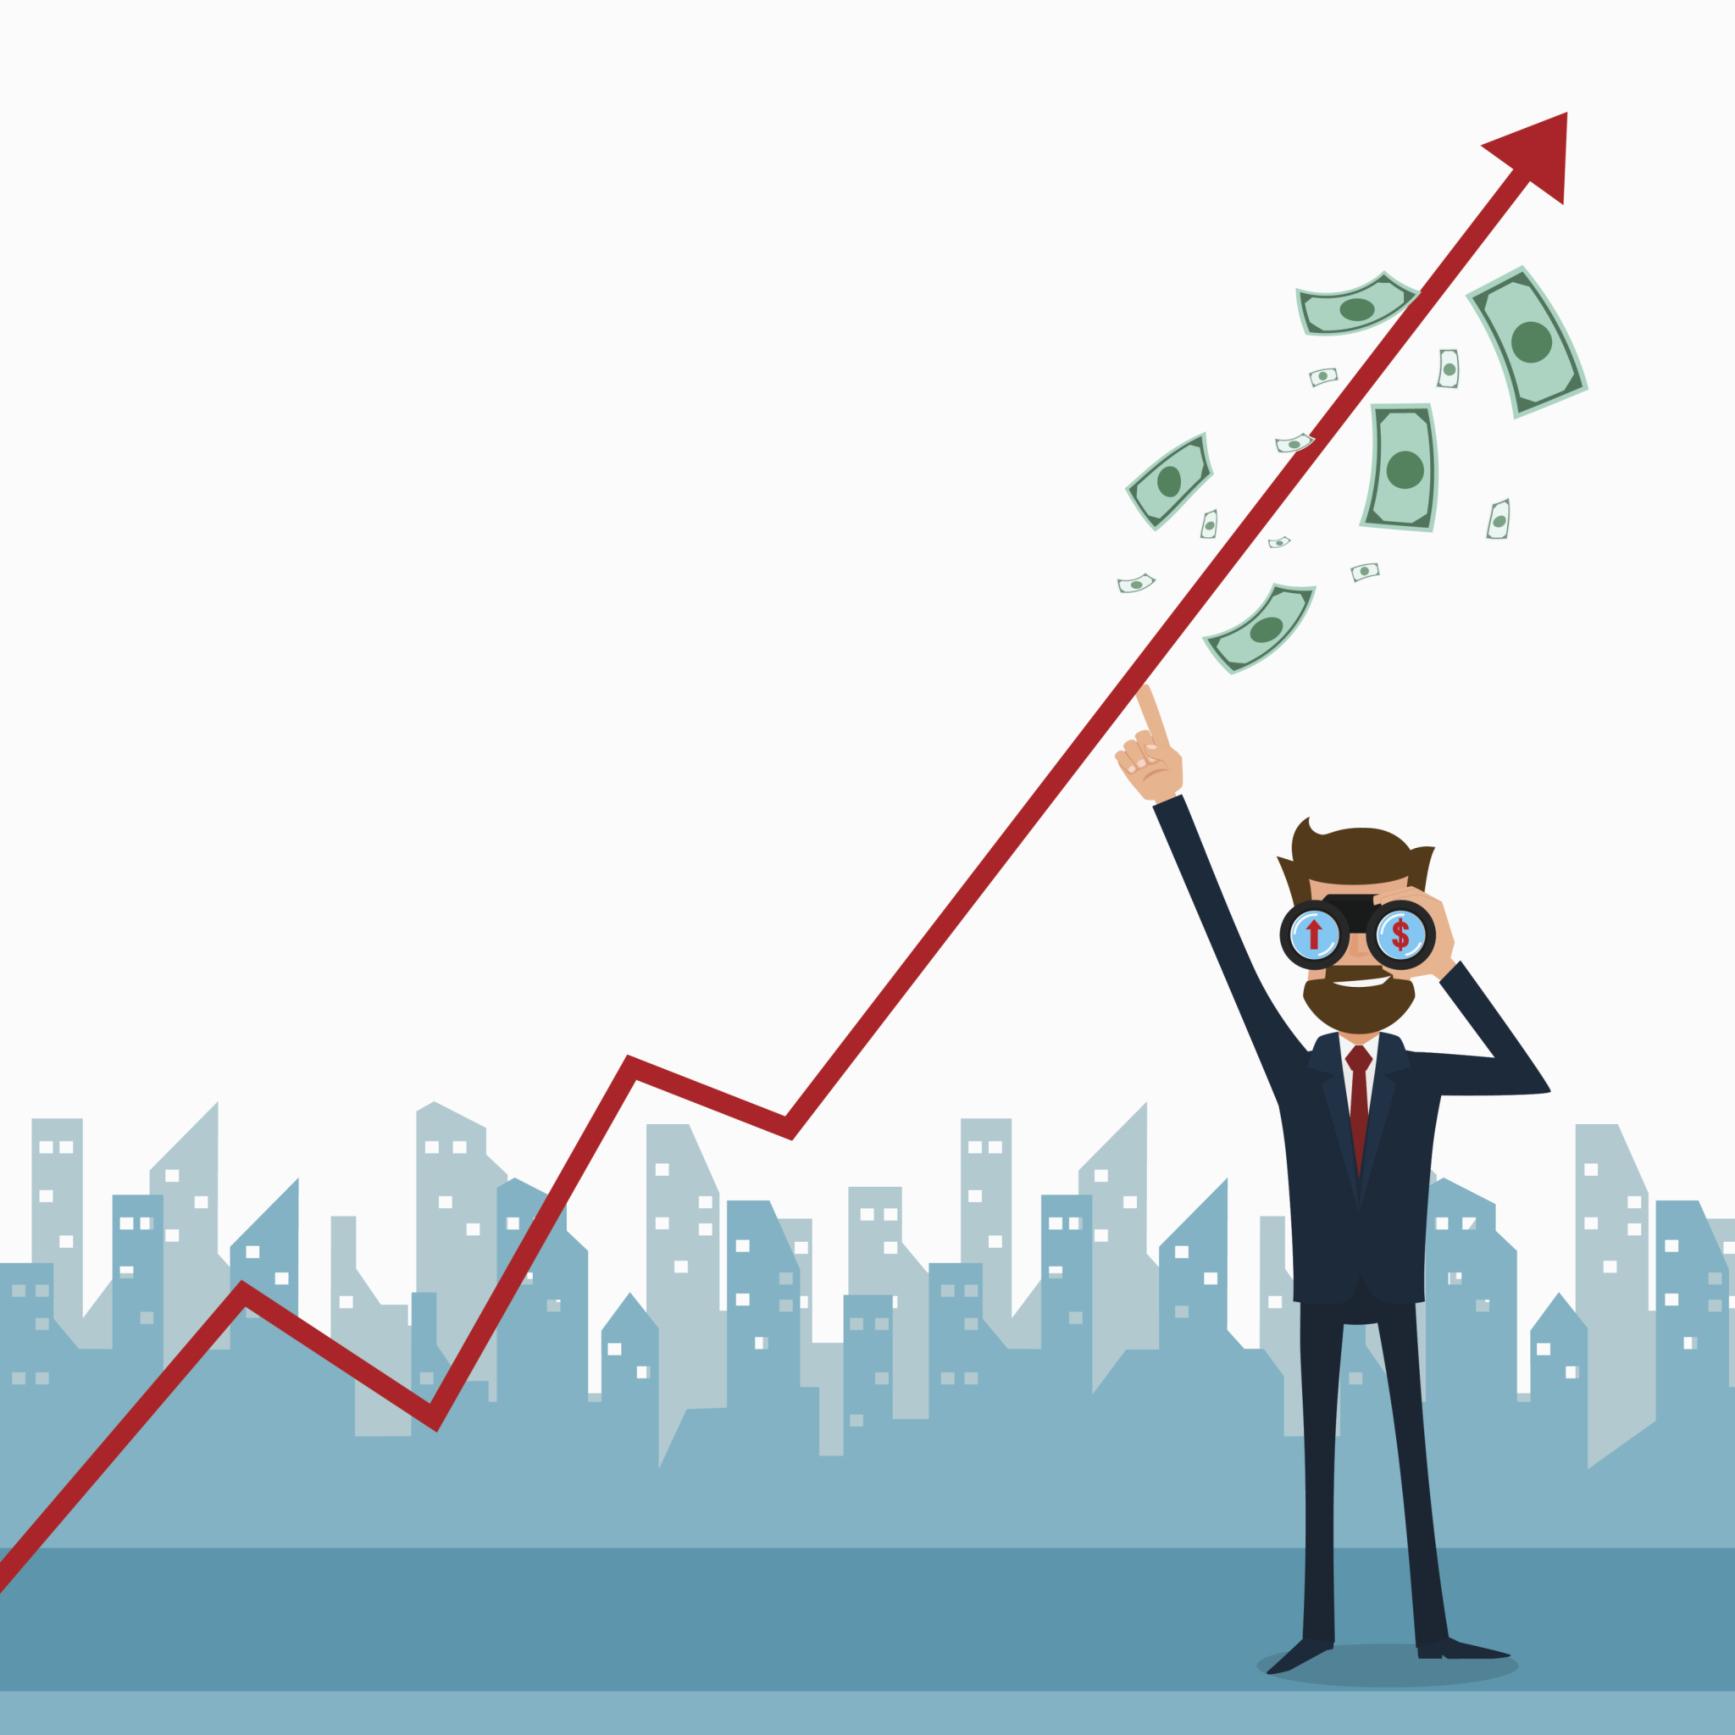 3 Top Stocks Under $5 | The Motley Fool